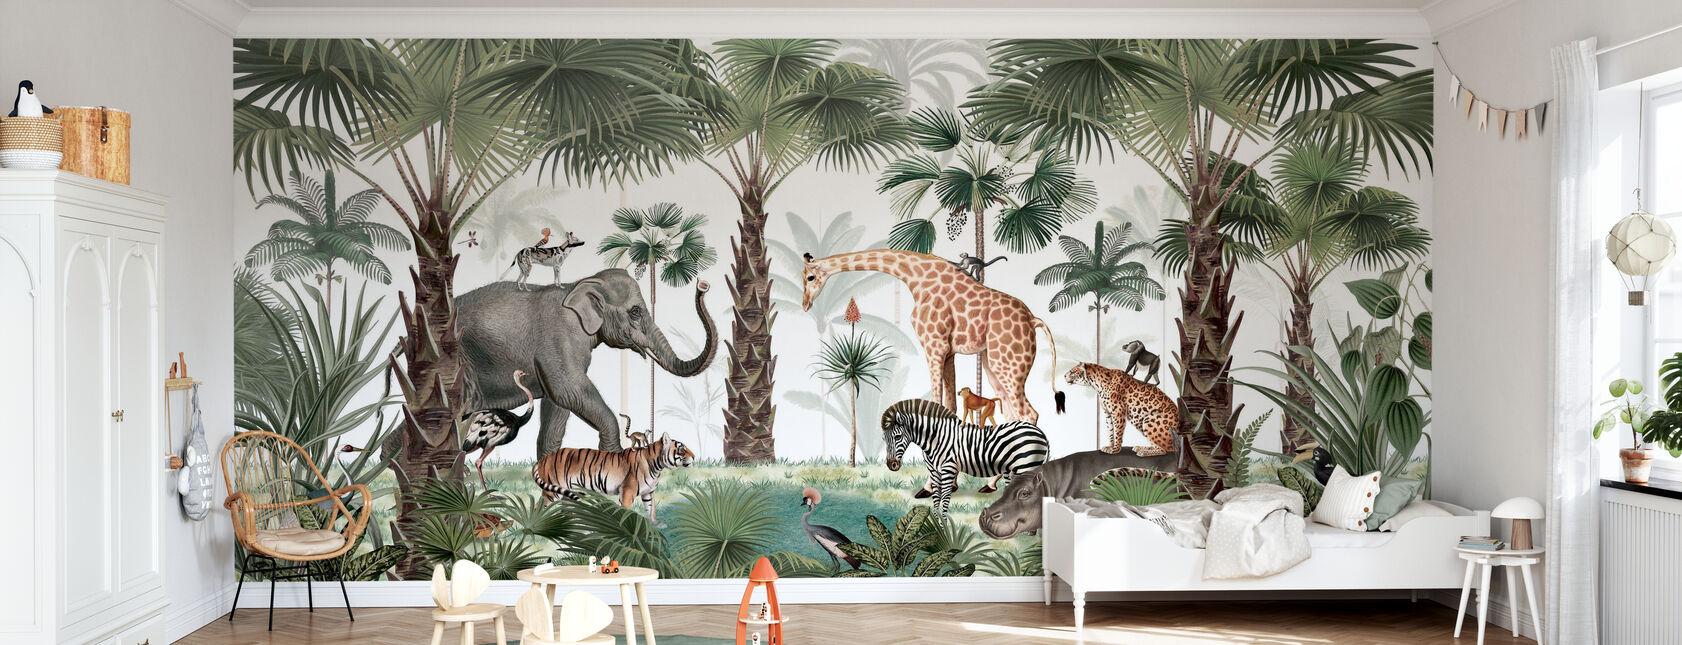 Animal Kingdom - Wallpaper - Kids Room